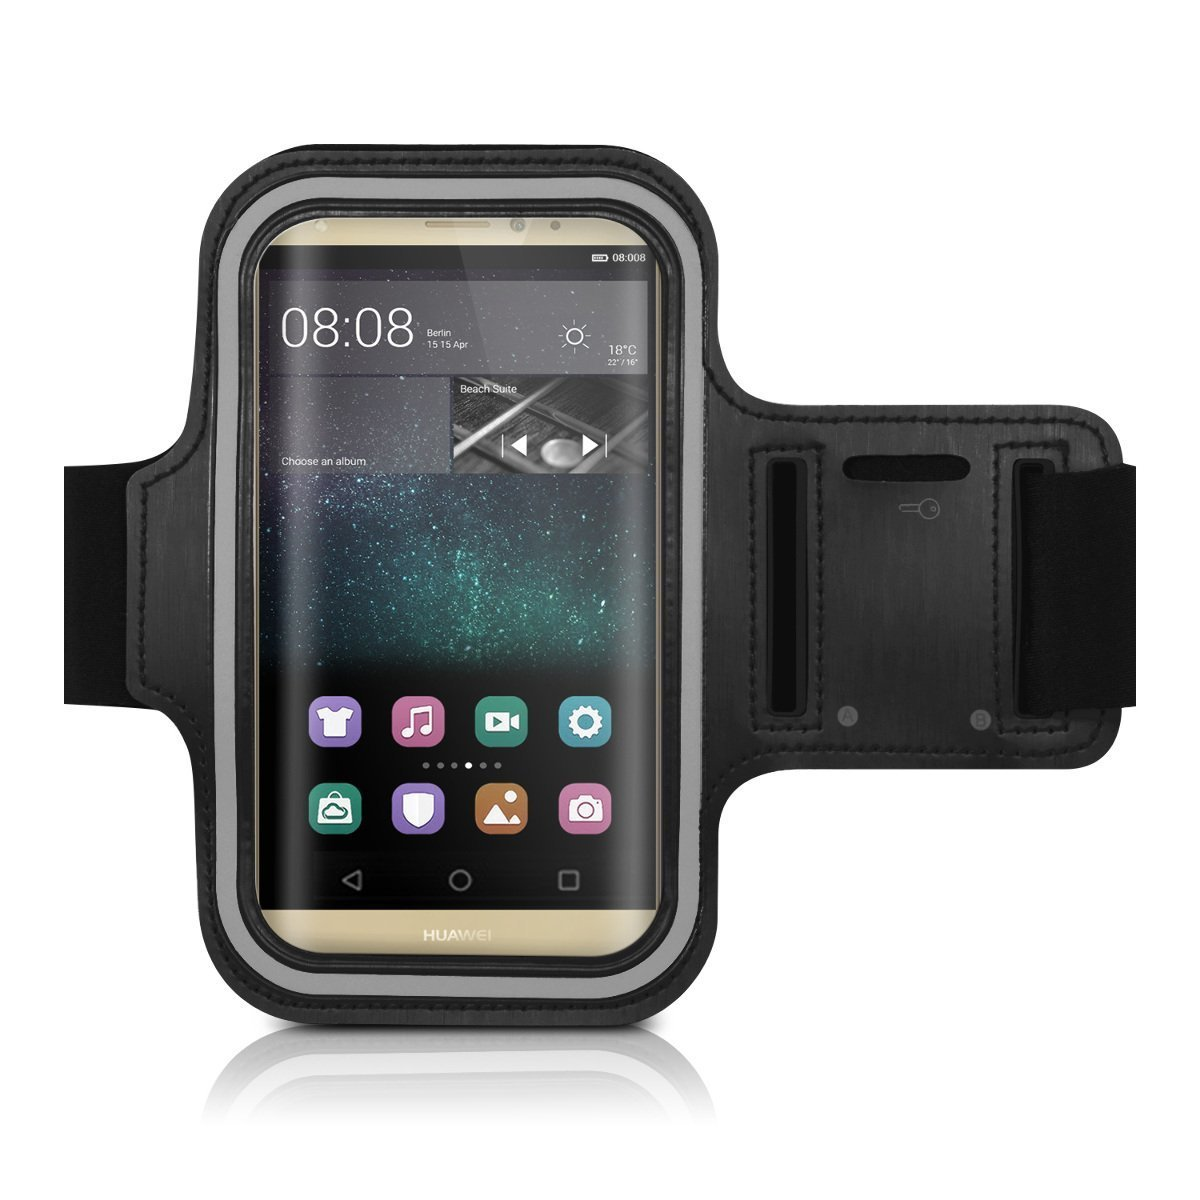 Cover kingz Huawei PPPlus PLite PPPlus PLite Mate brazalete deportivo Fitness móvil